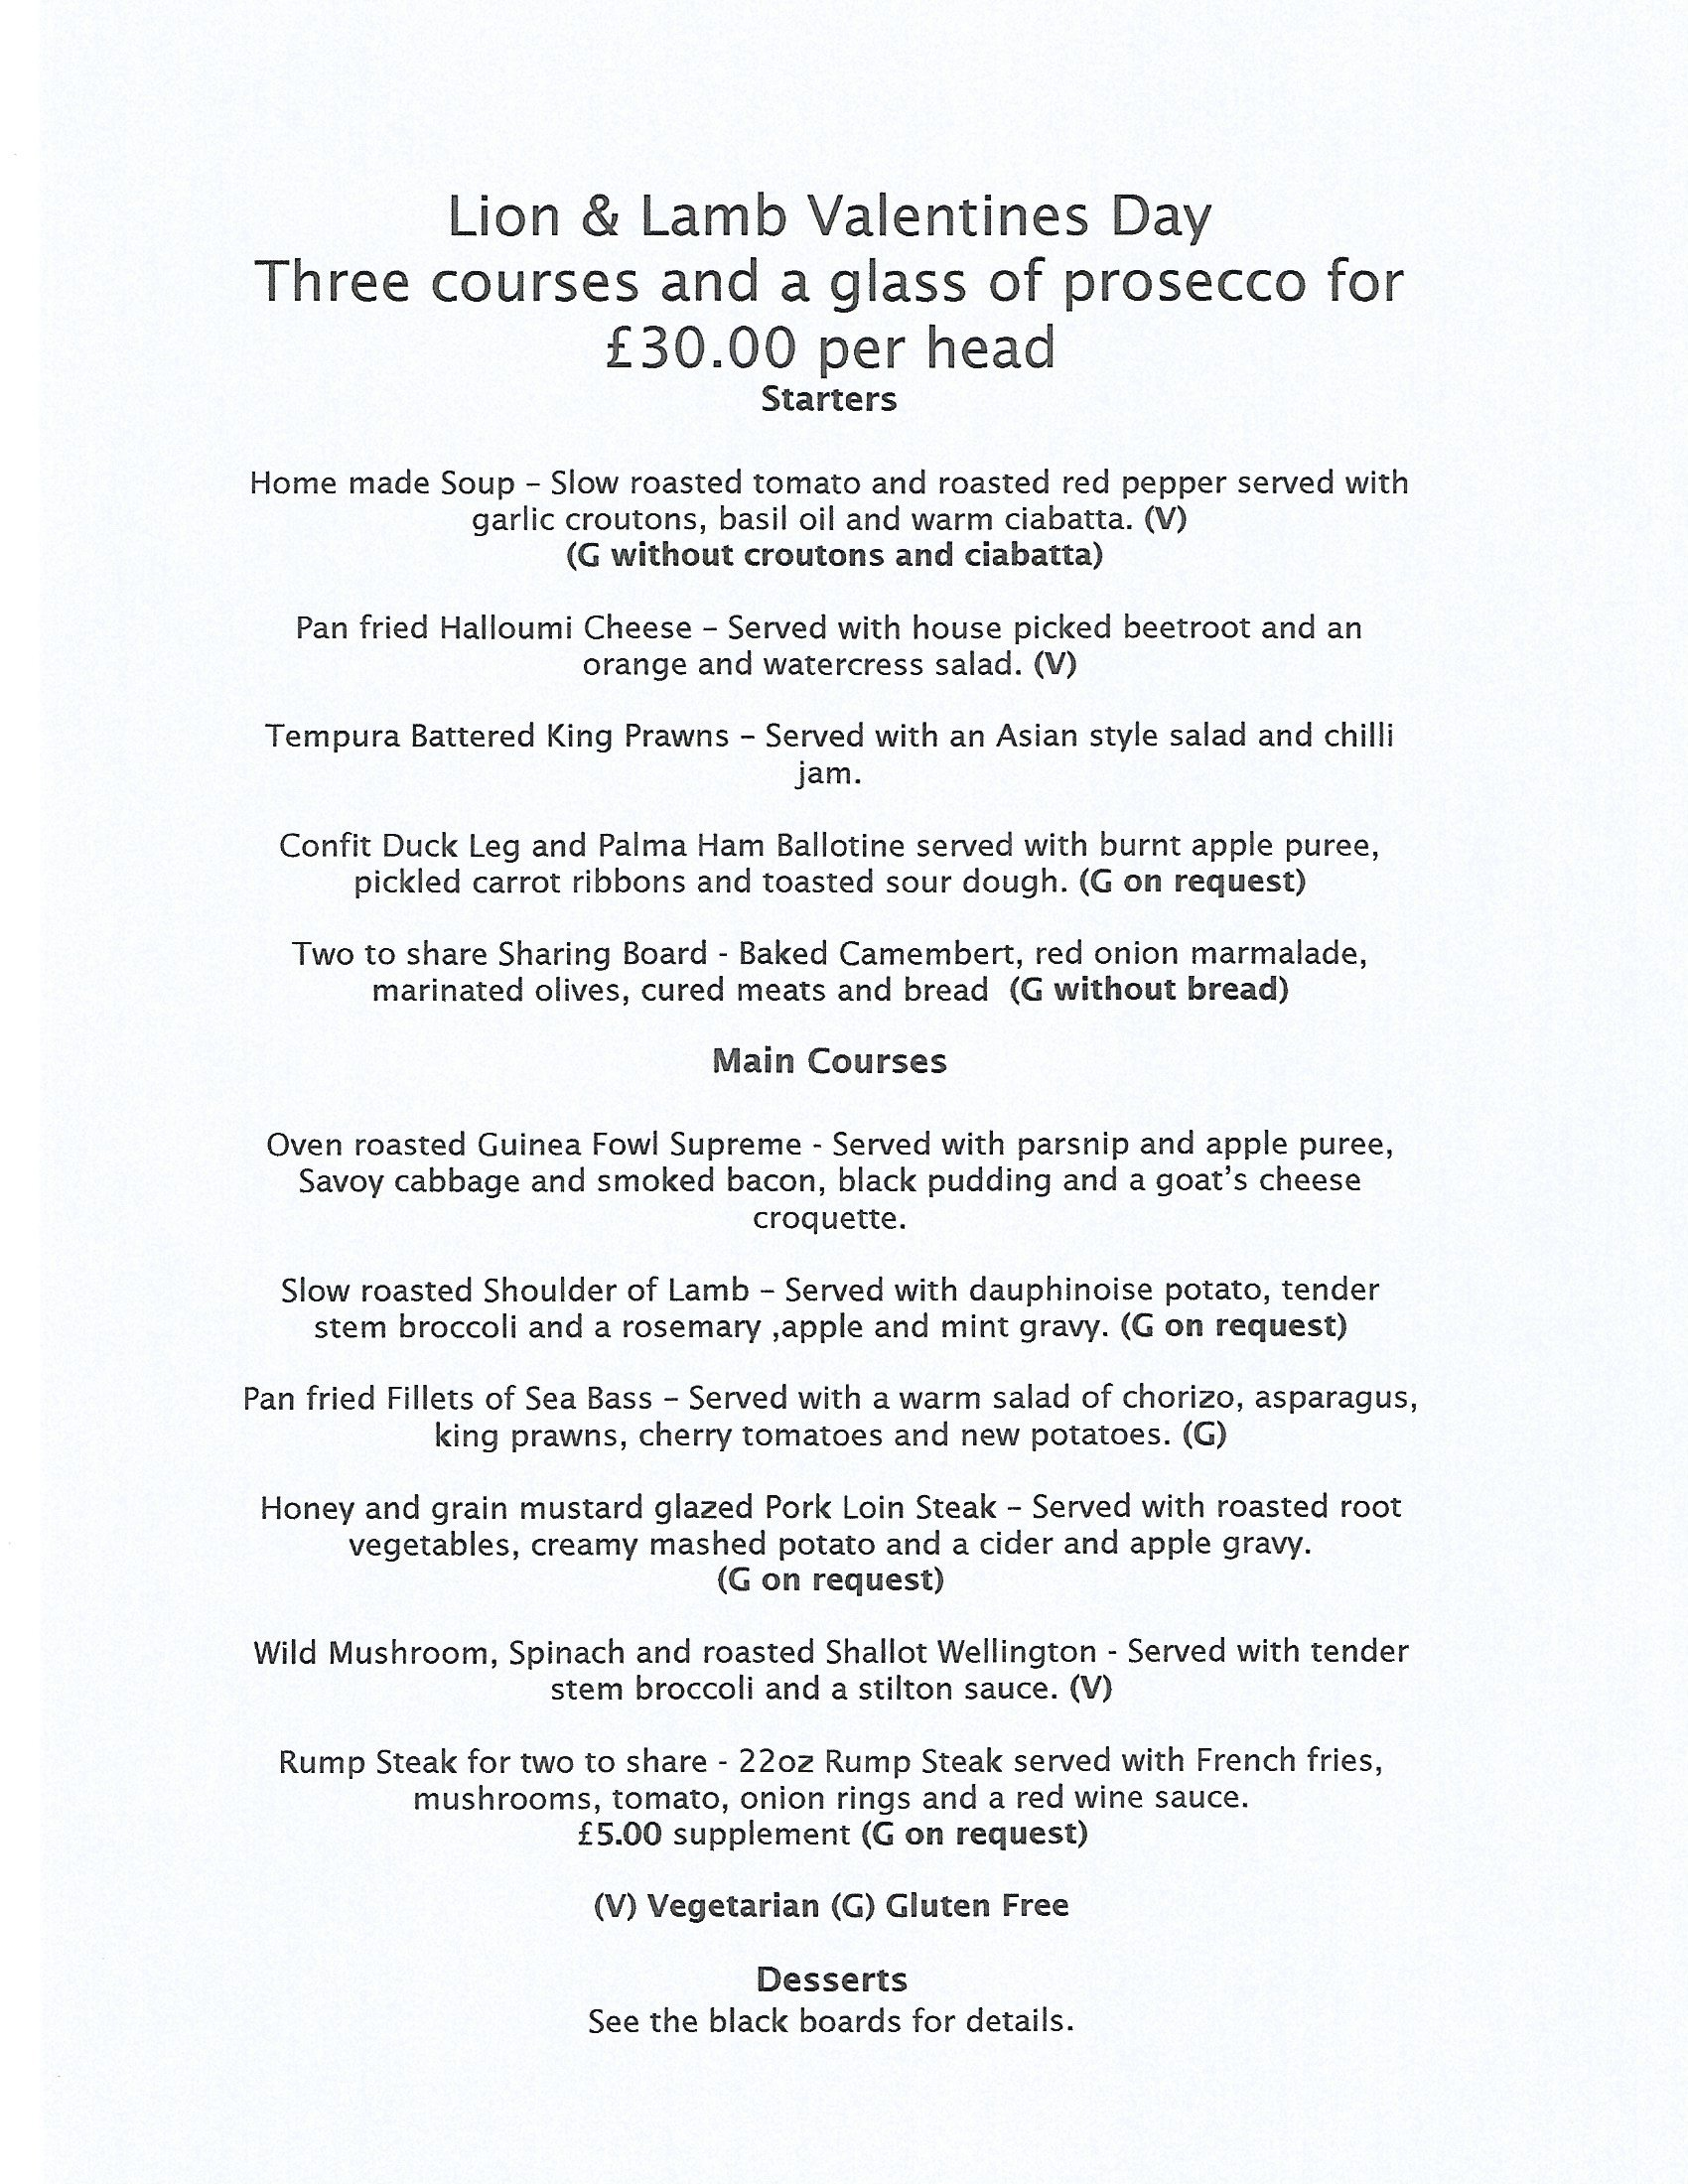 gastro pub horsley newcastle upon tyne tyne and wear lion u0026 lamb